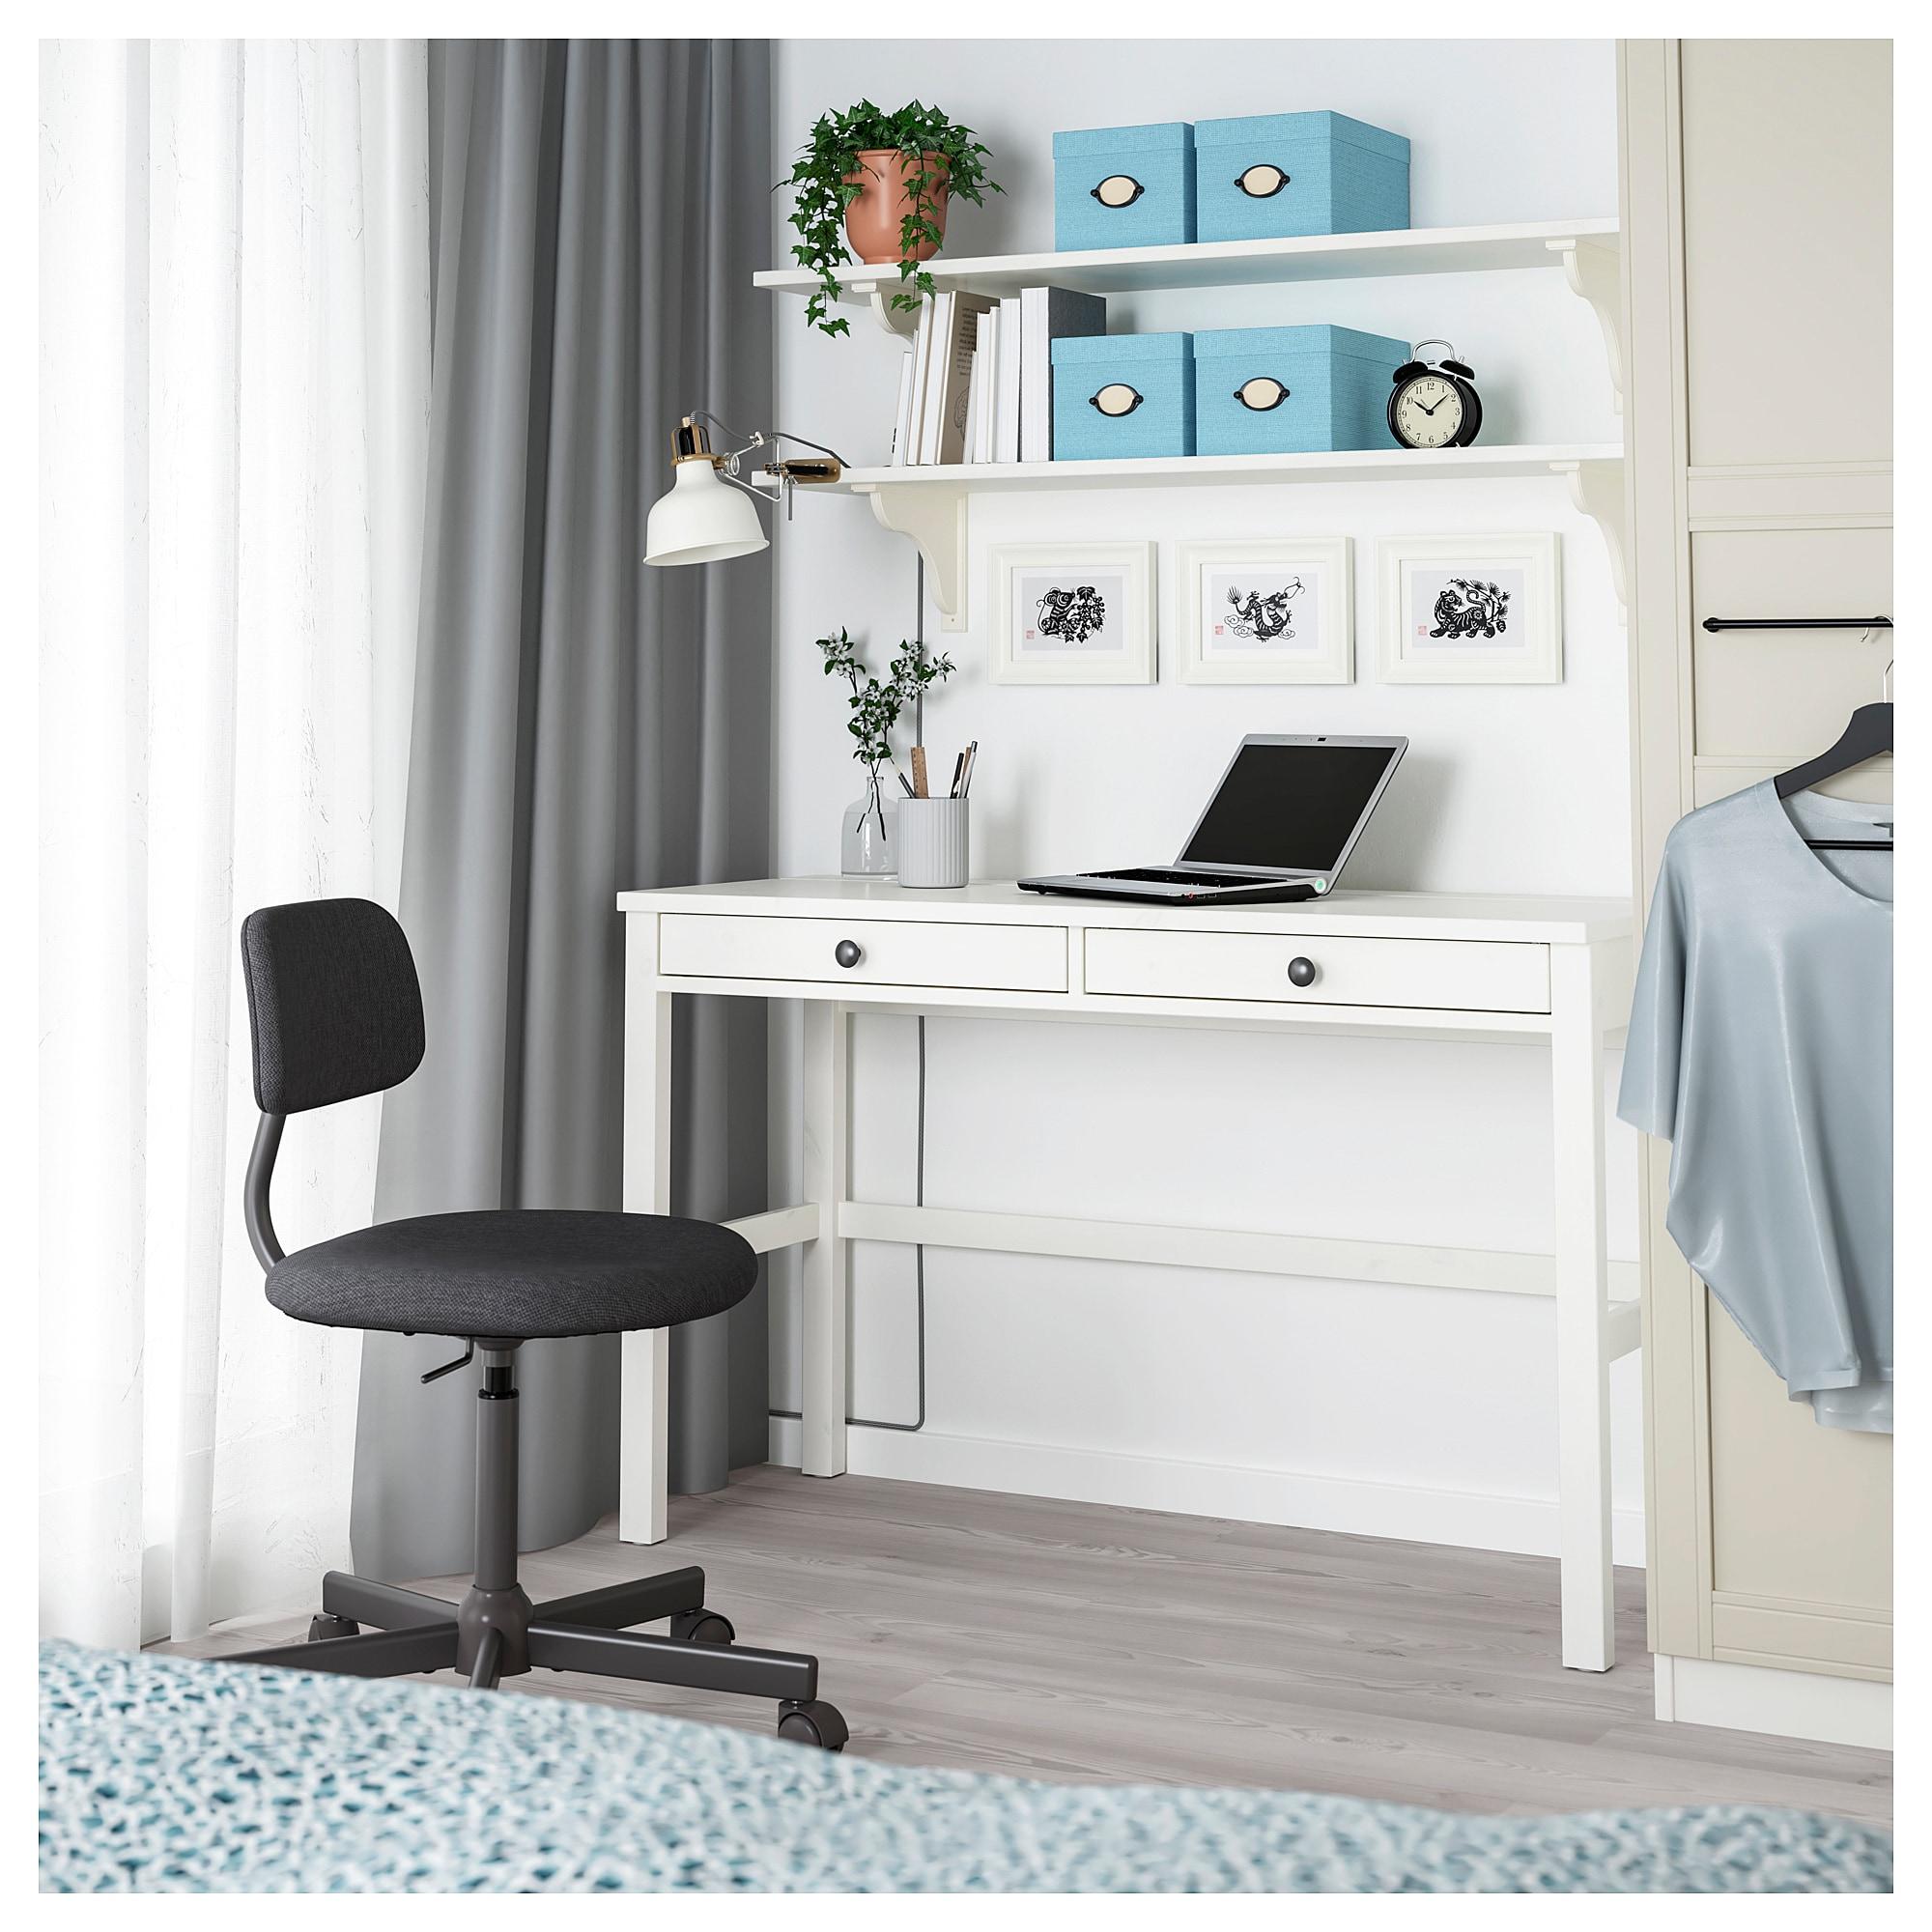 Australia Hemnes, Ikea hemnes desk, Furniture